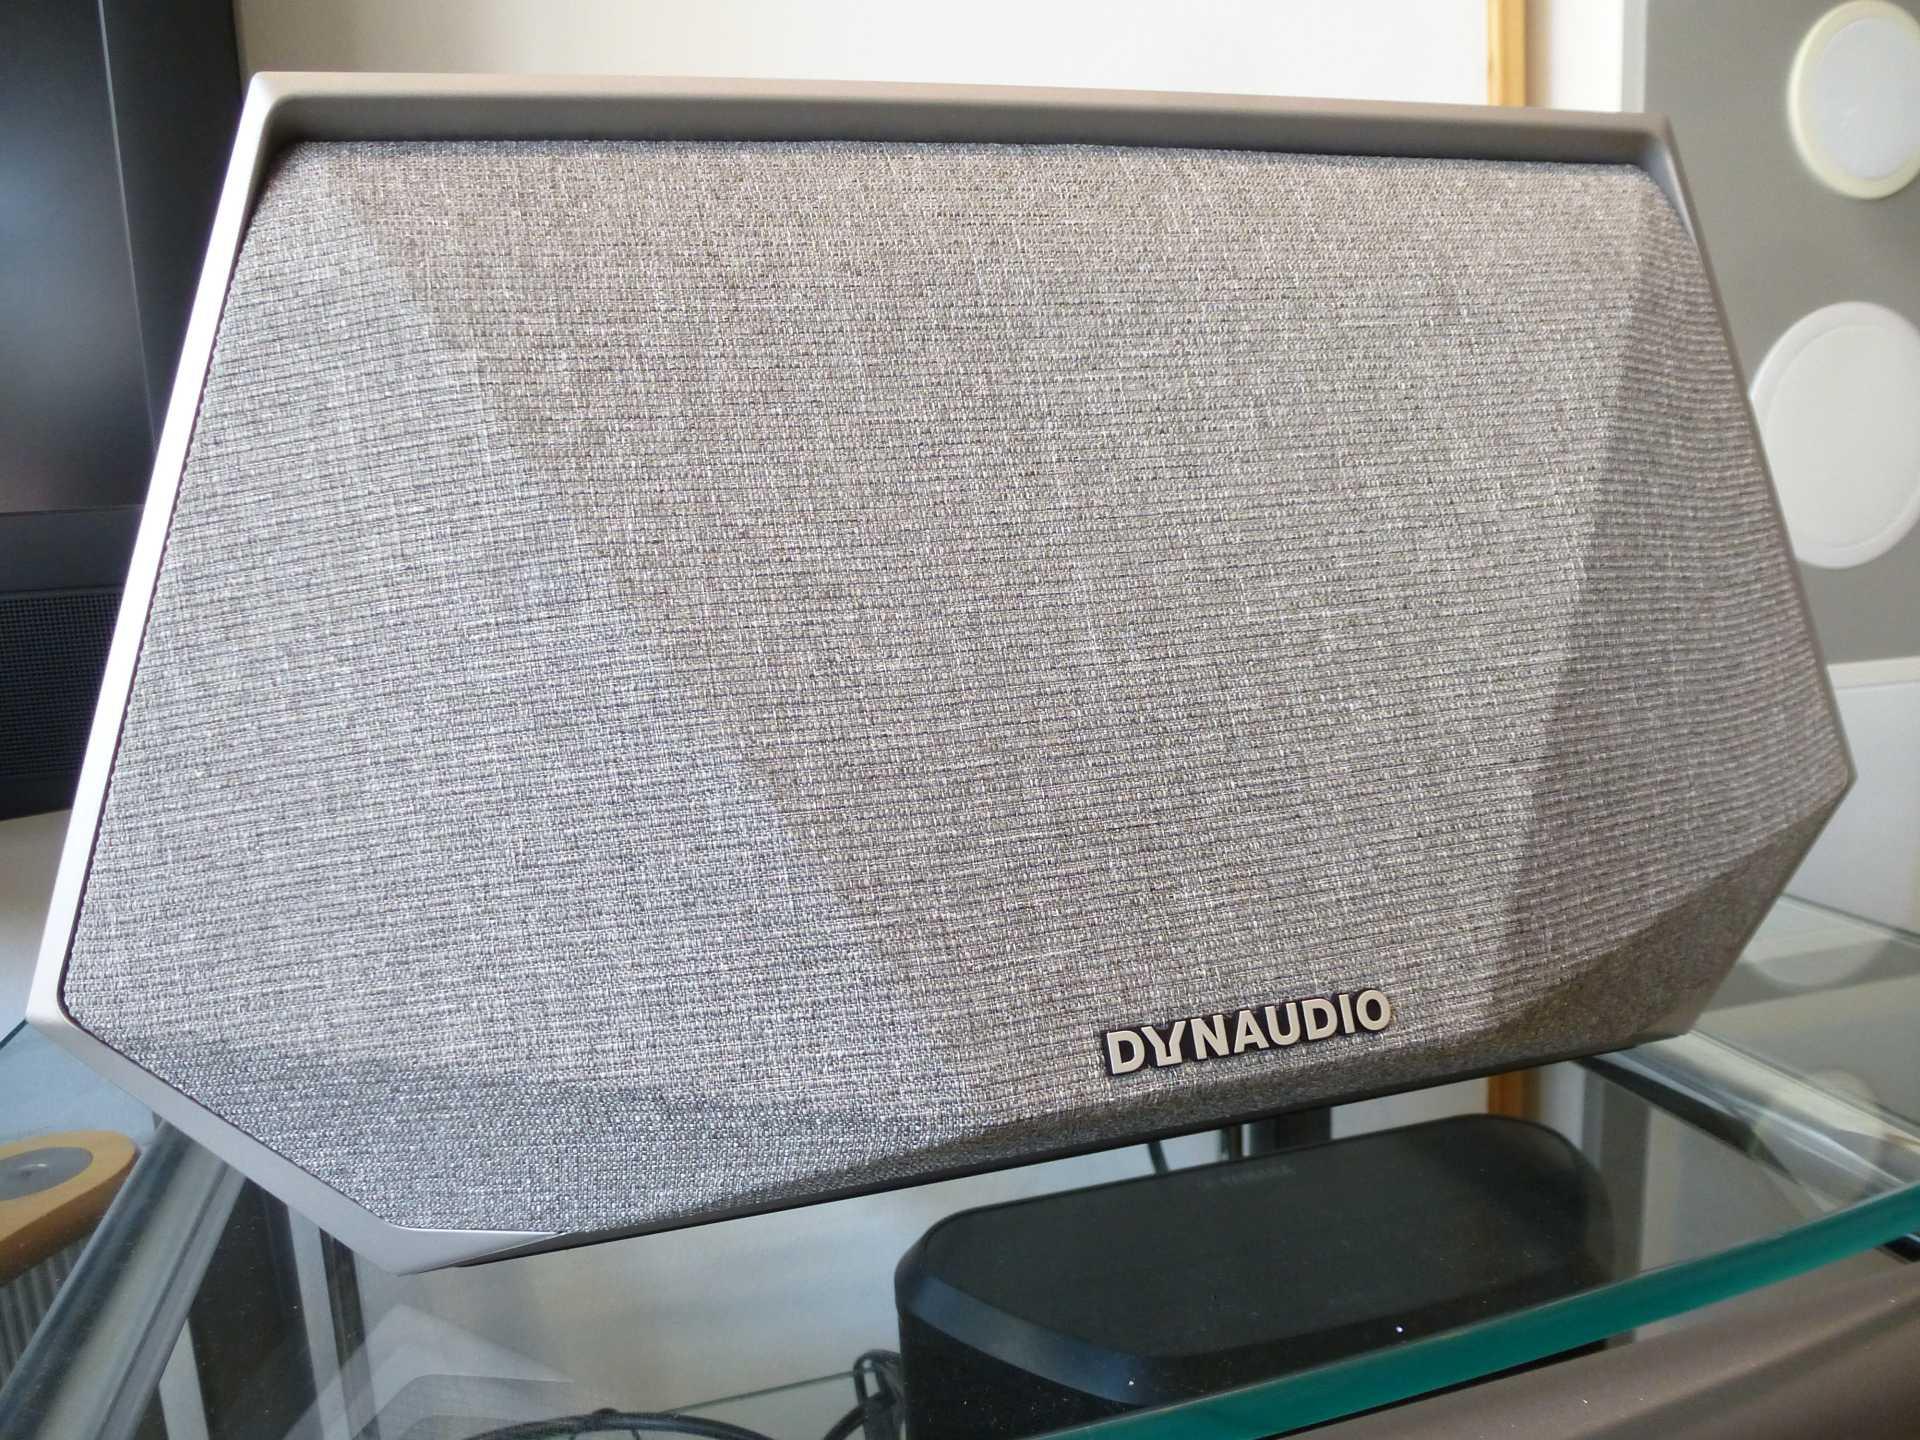 Schön Lautstärkedurchmesser Des Lautsprecherkabels Ideen - Der ...